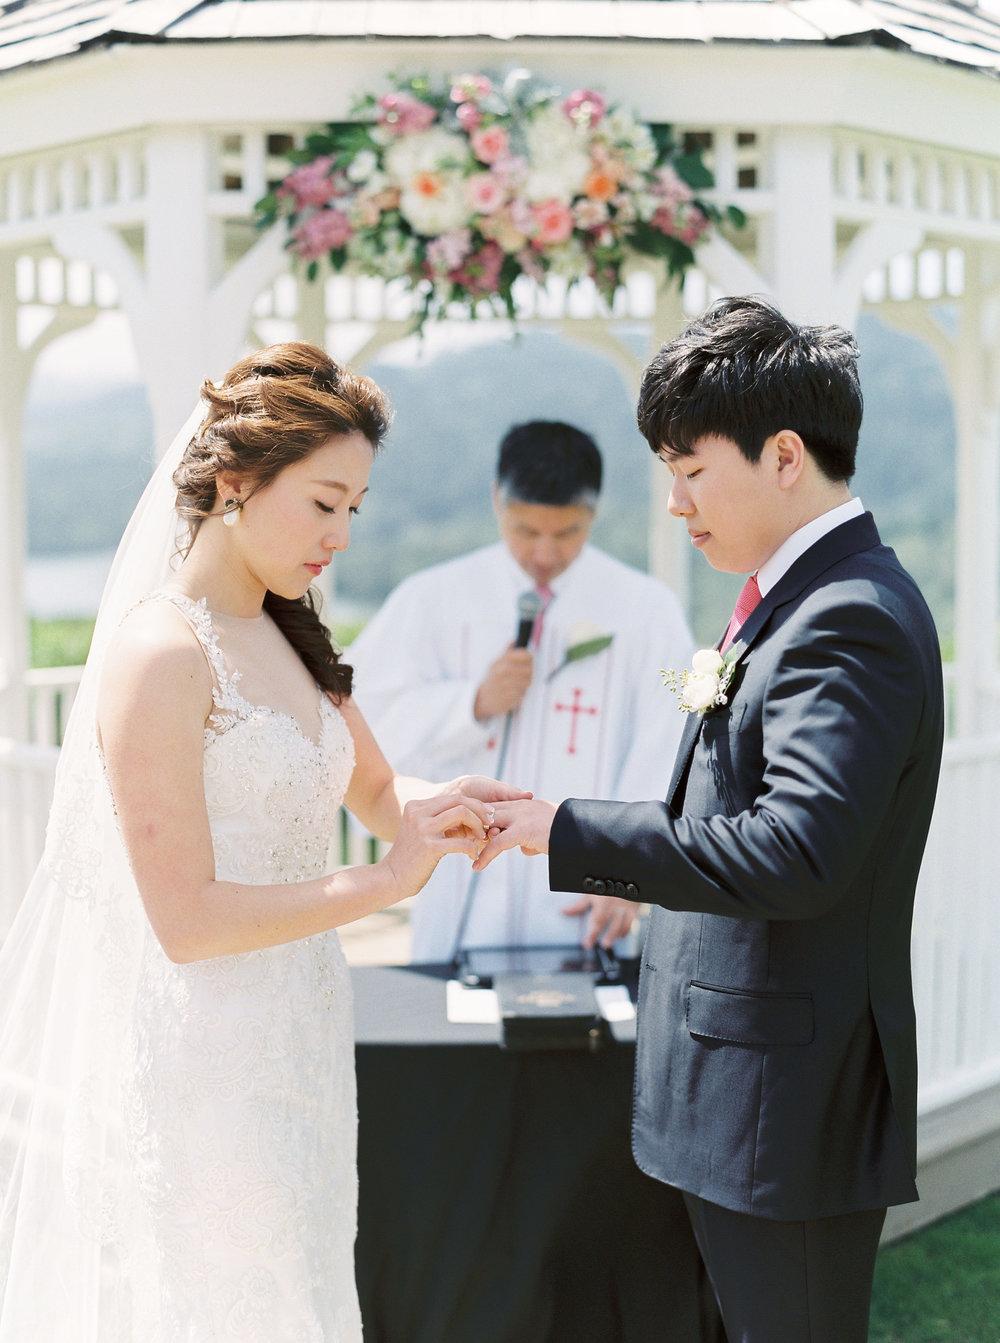 mountaintop-wedding-at-crystal-springs-burlingame-california-52.jpg